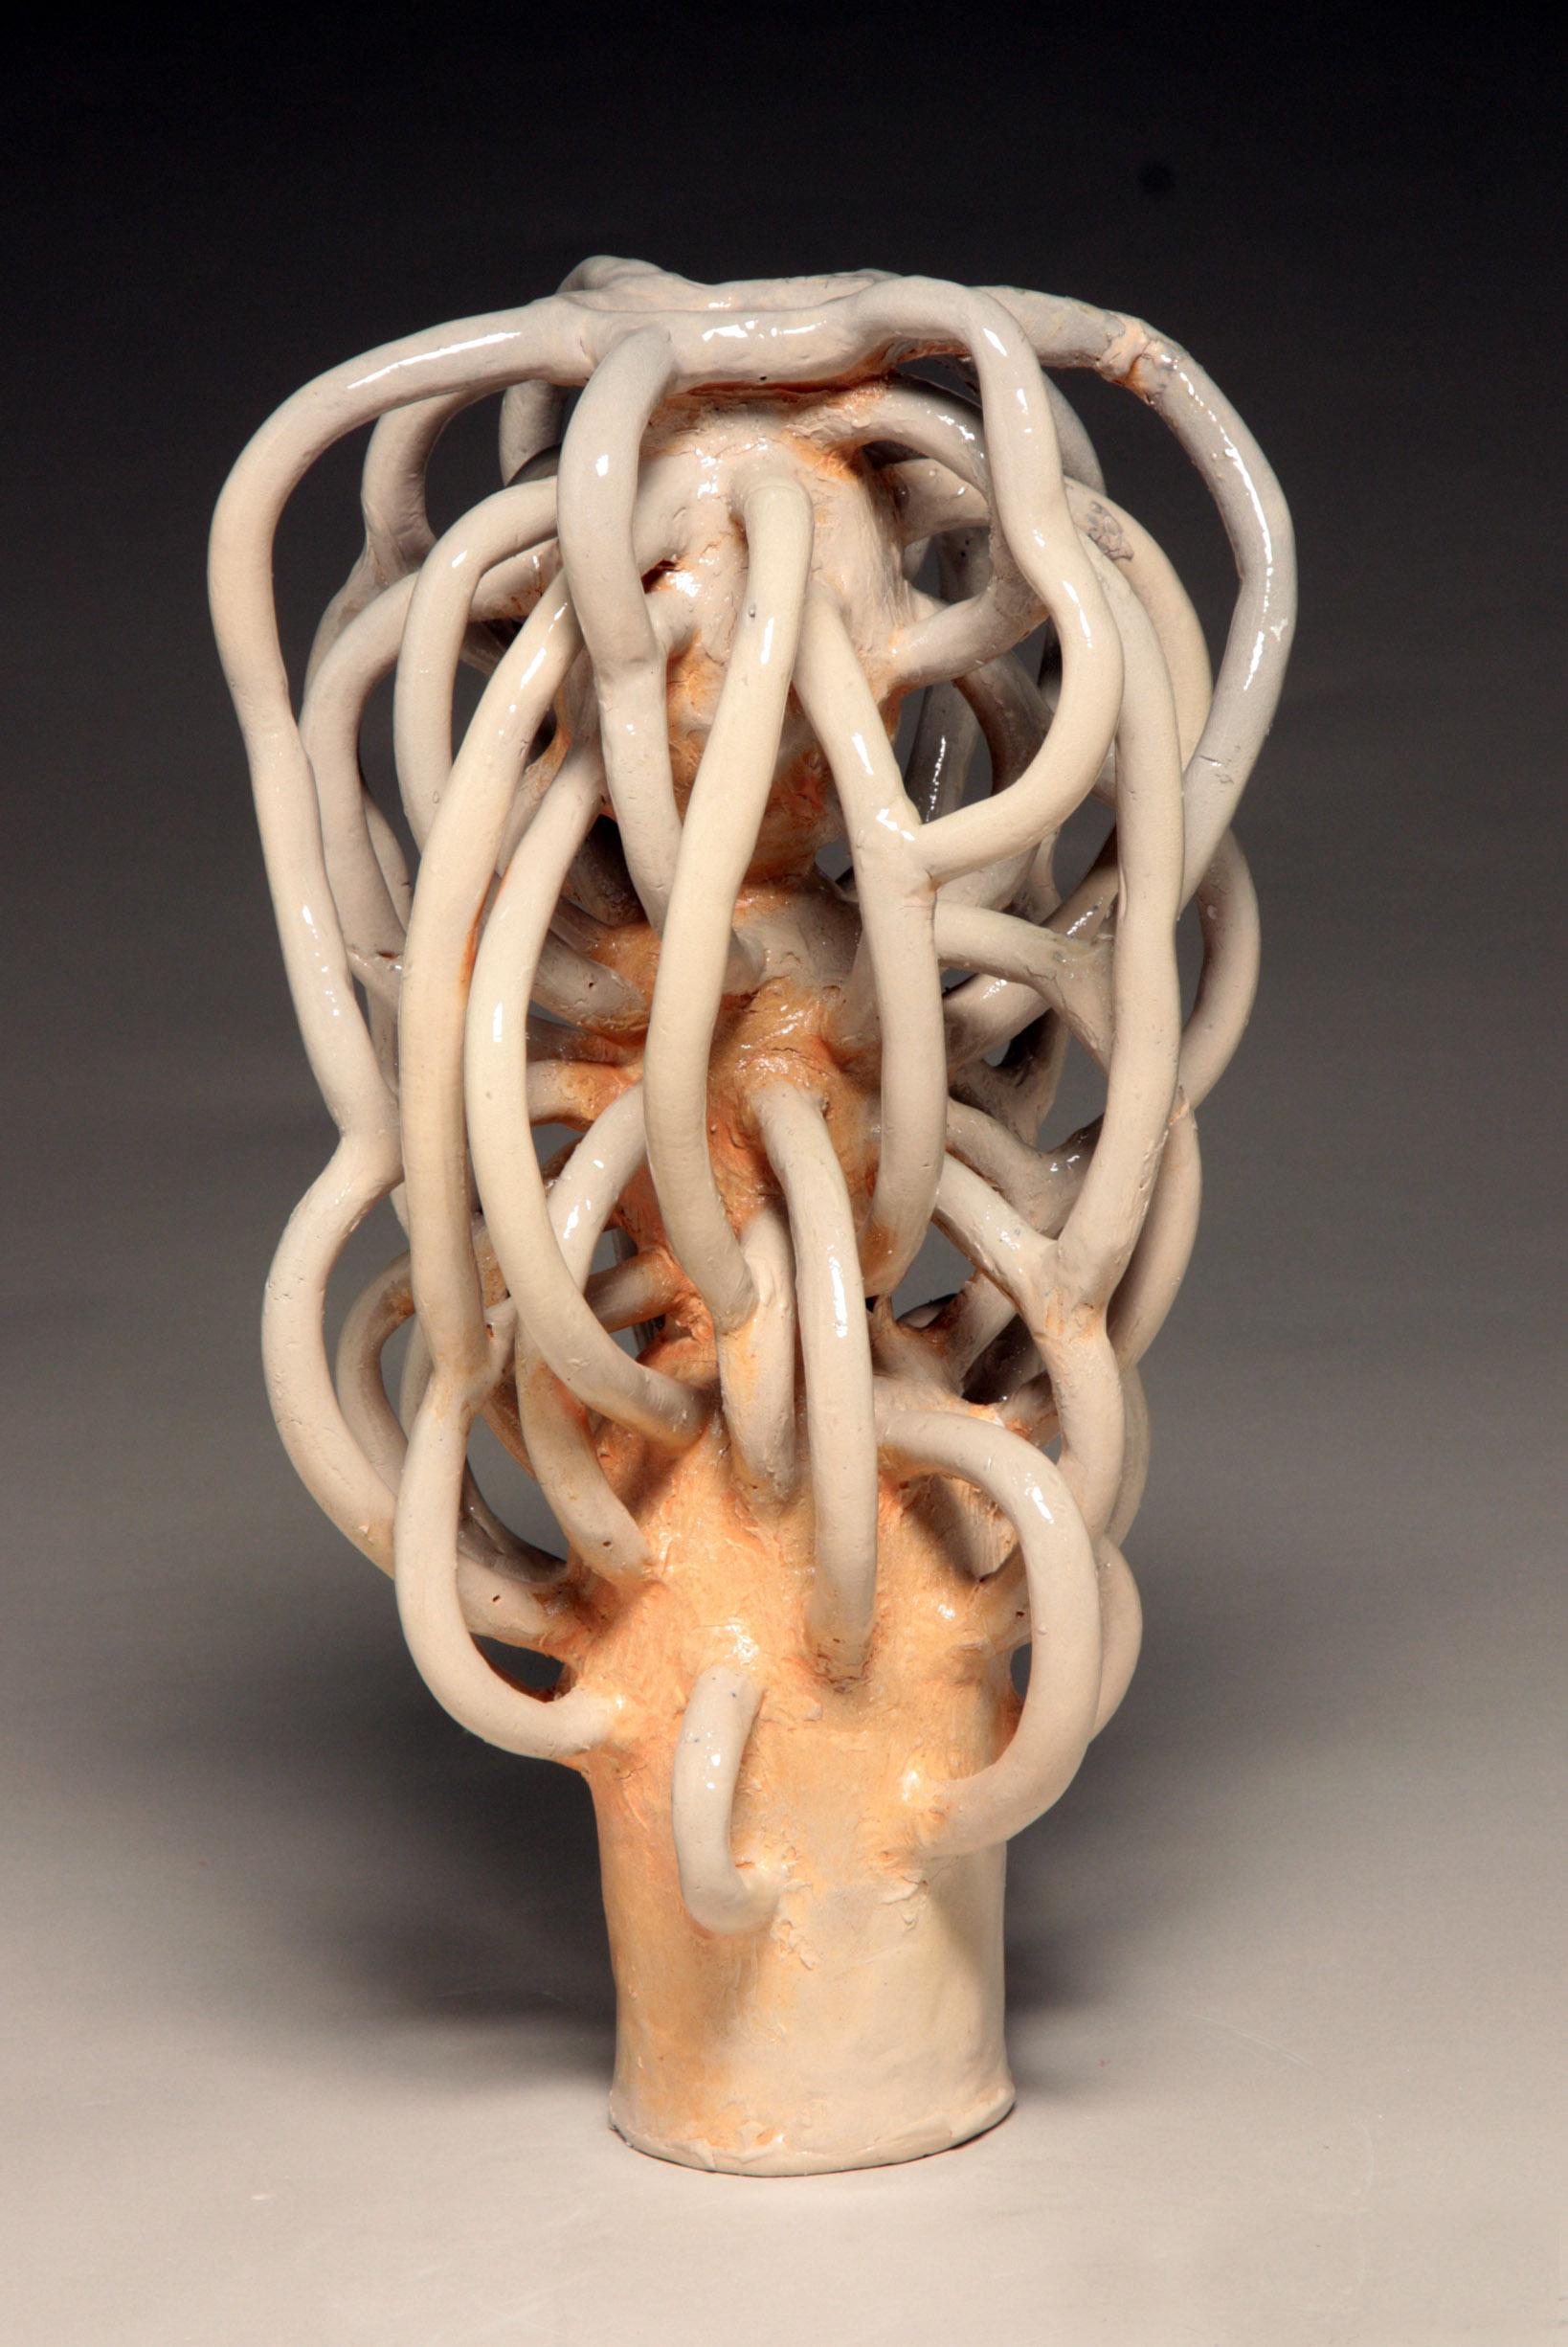 Tubes, Slabs, One Hole, 2013